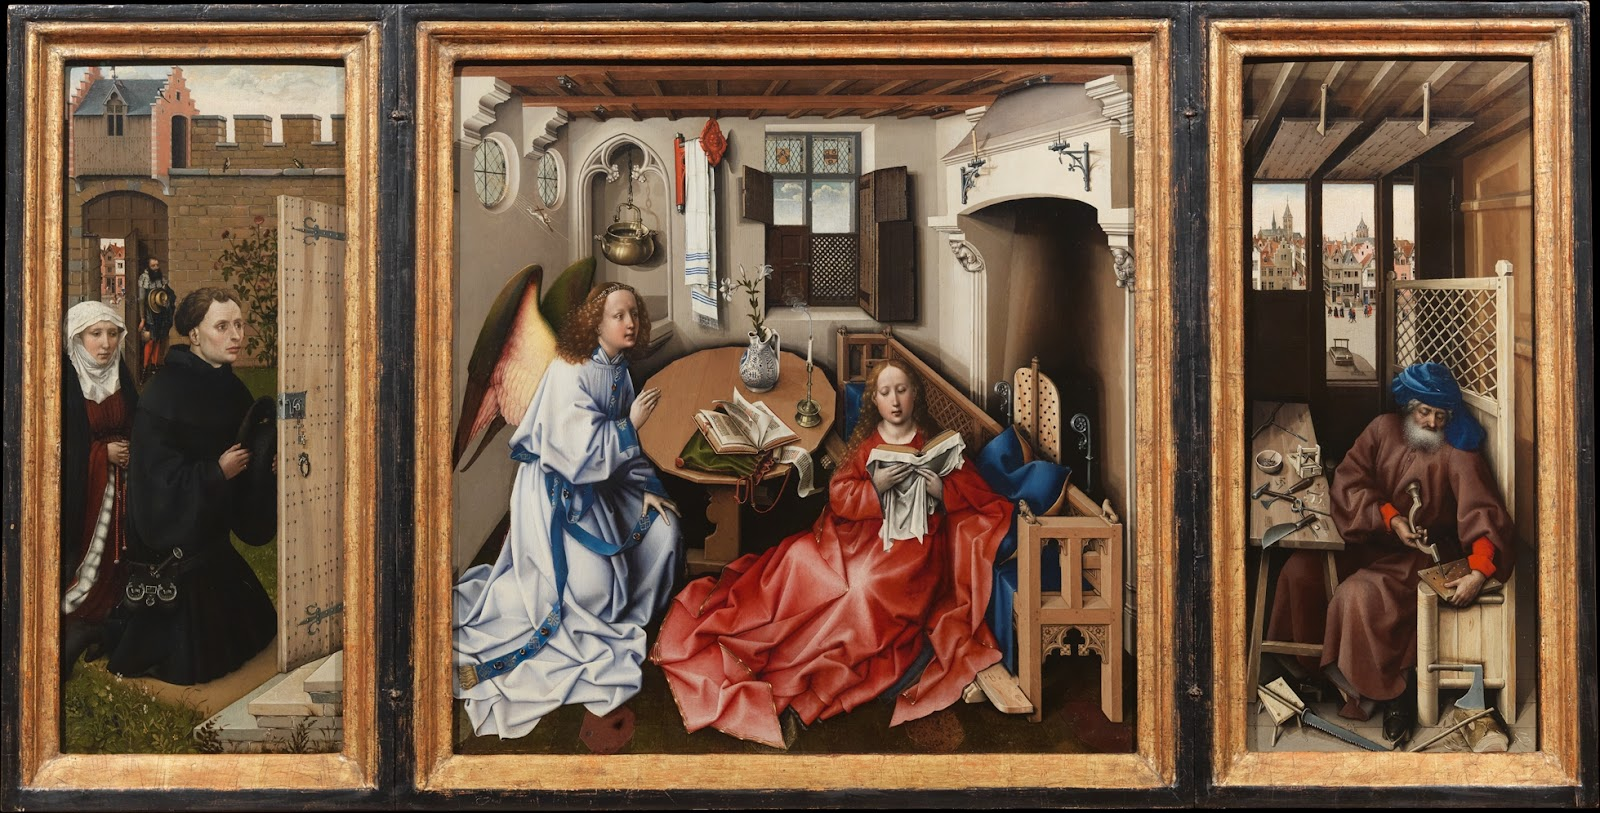 Robert Campin, The Annunciation: Merode Altarpiece